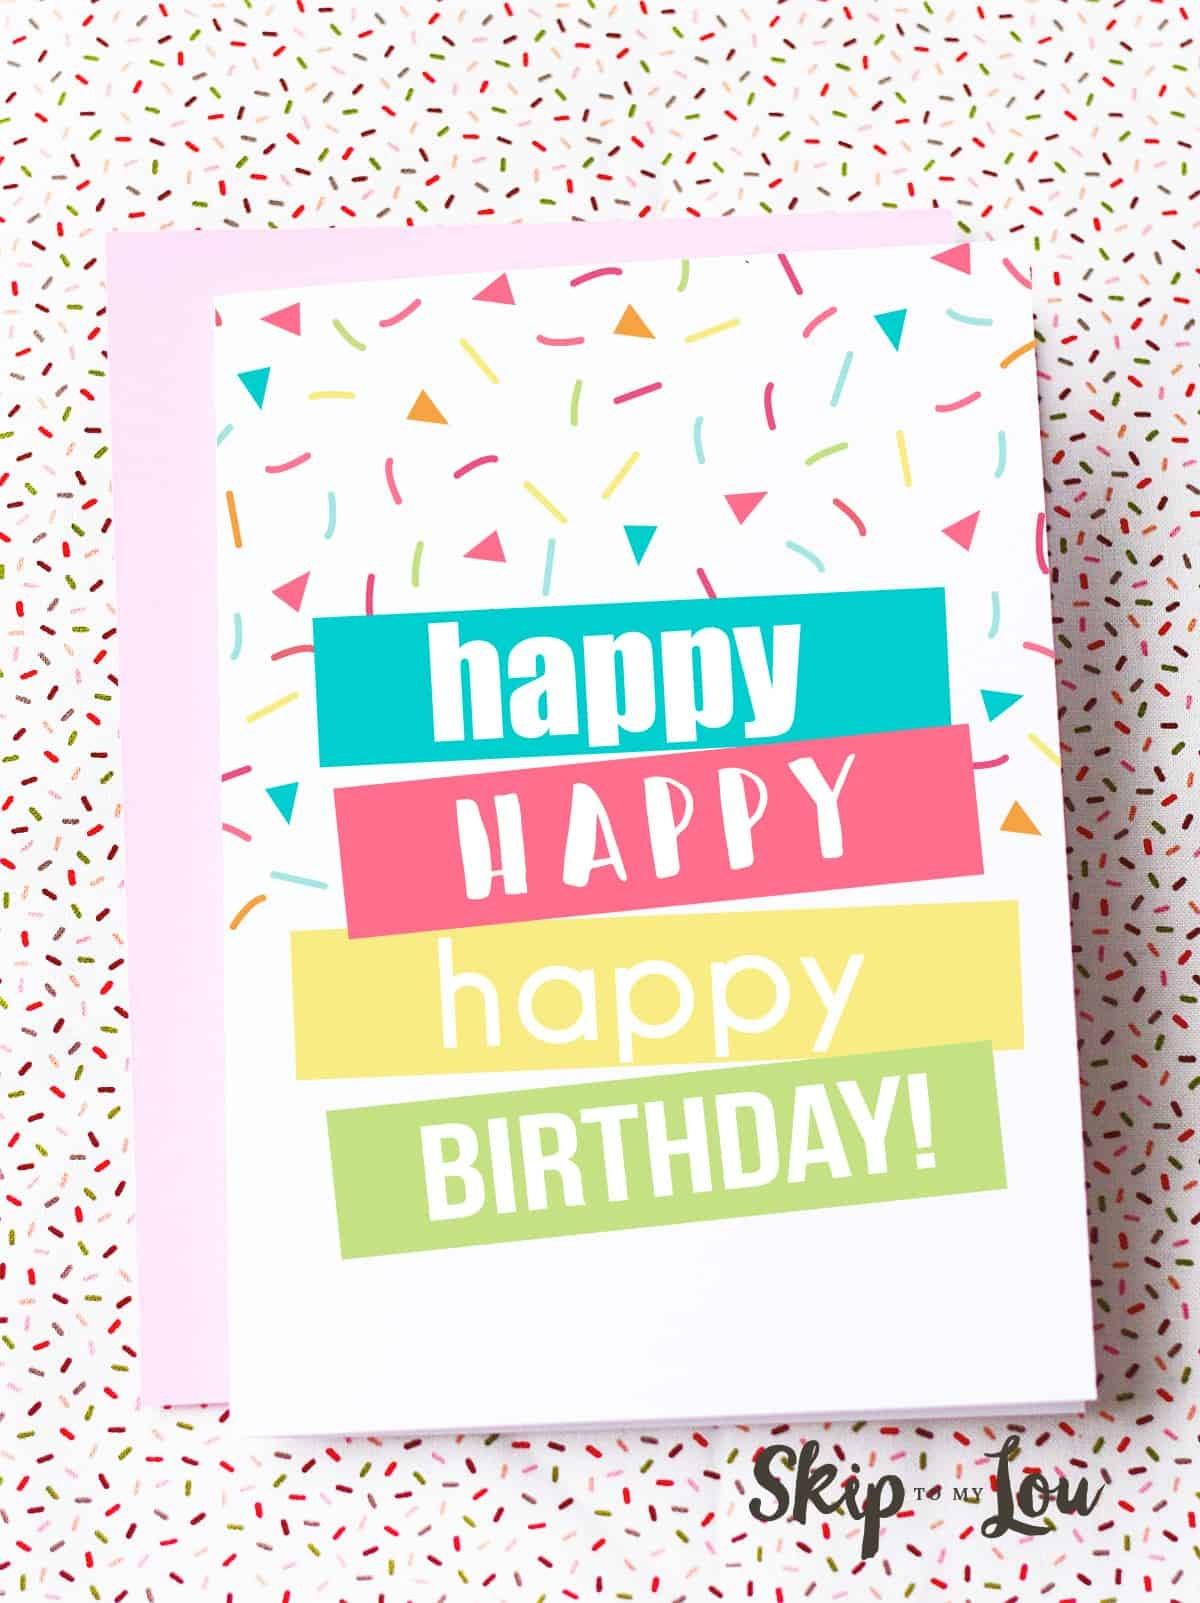 Happy Birthday Cards Printable - Tutlin.psstech.co - Free Printable Happy Birthday Cards